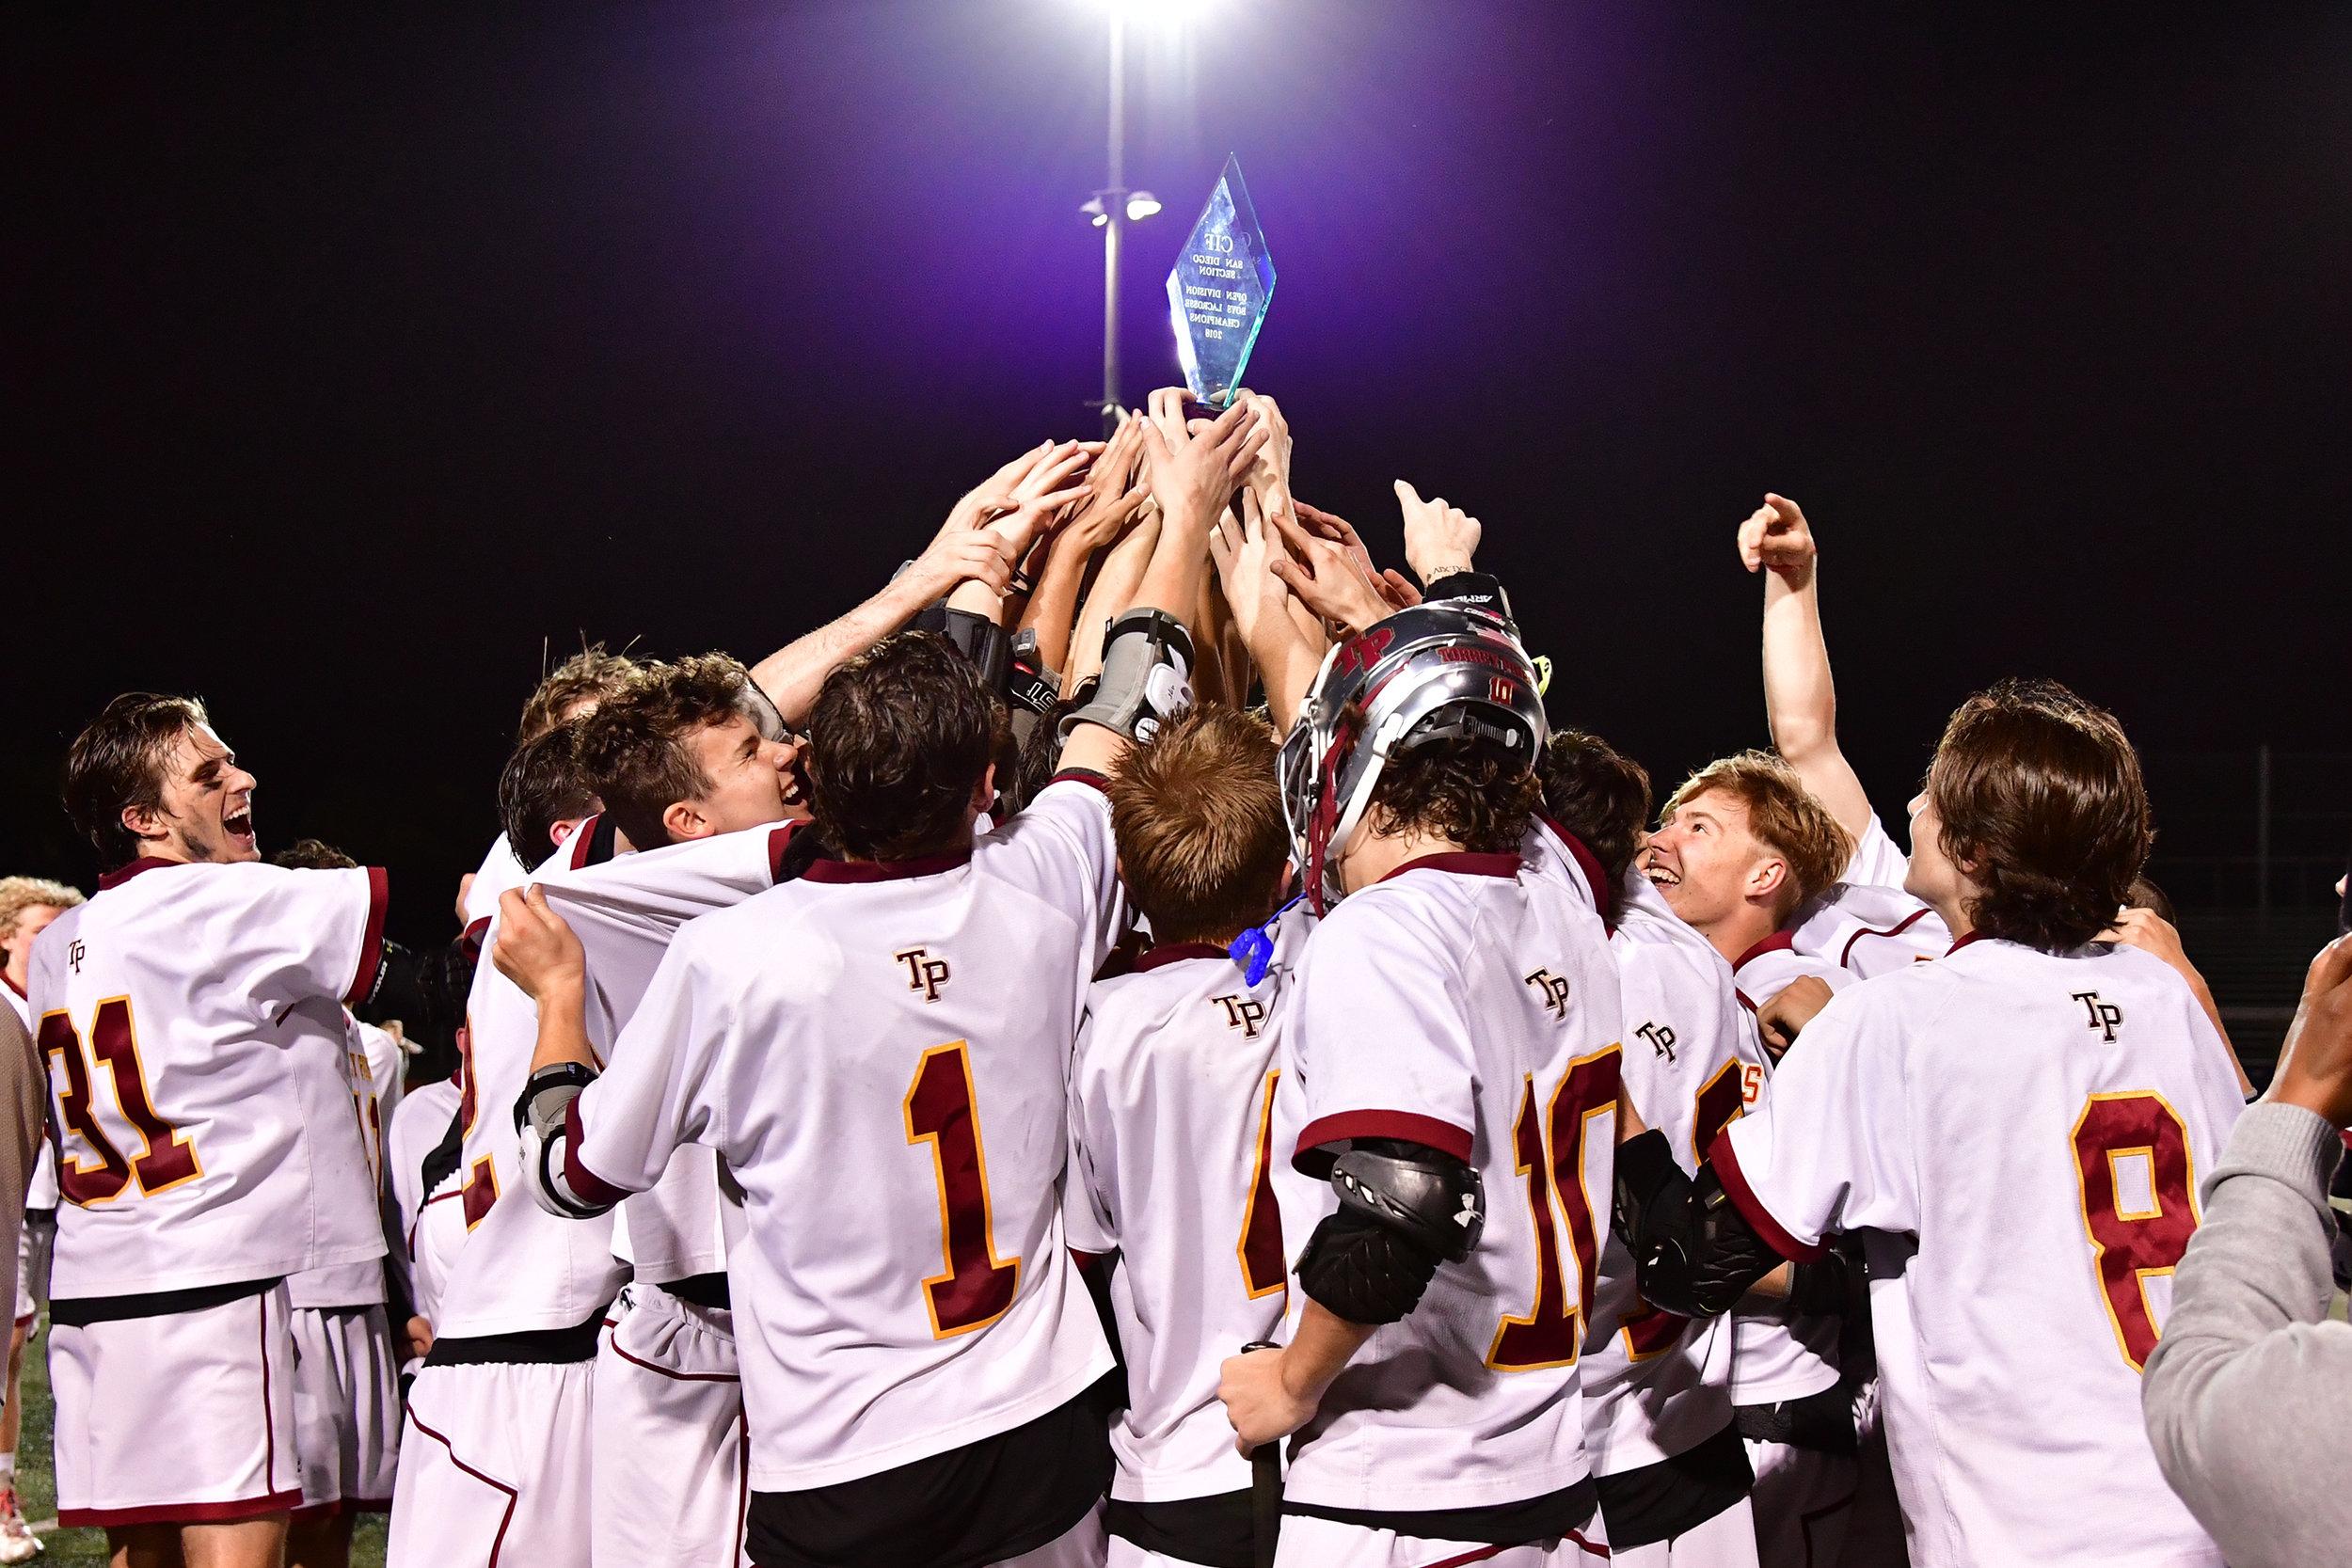 Torrey Pines boys claim CIF lacrosse title with comeback win over Coronado